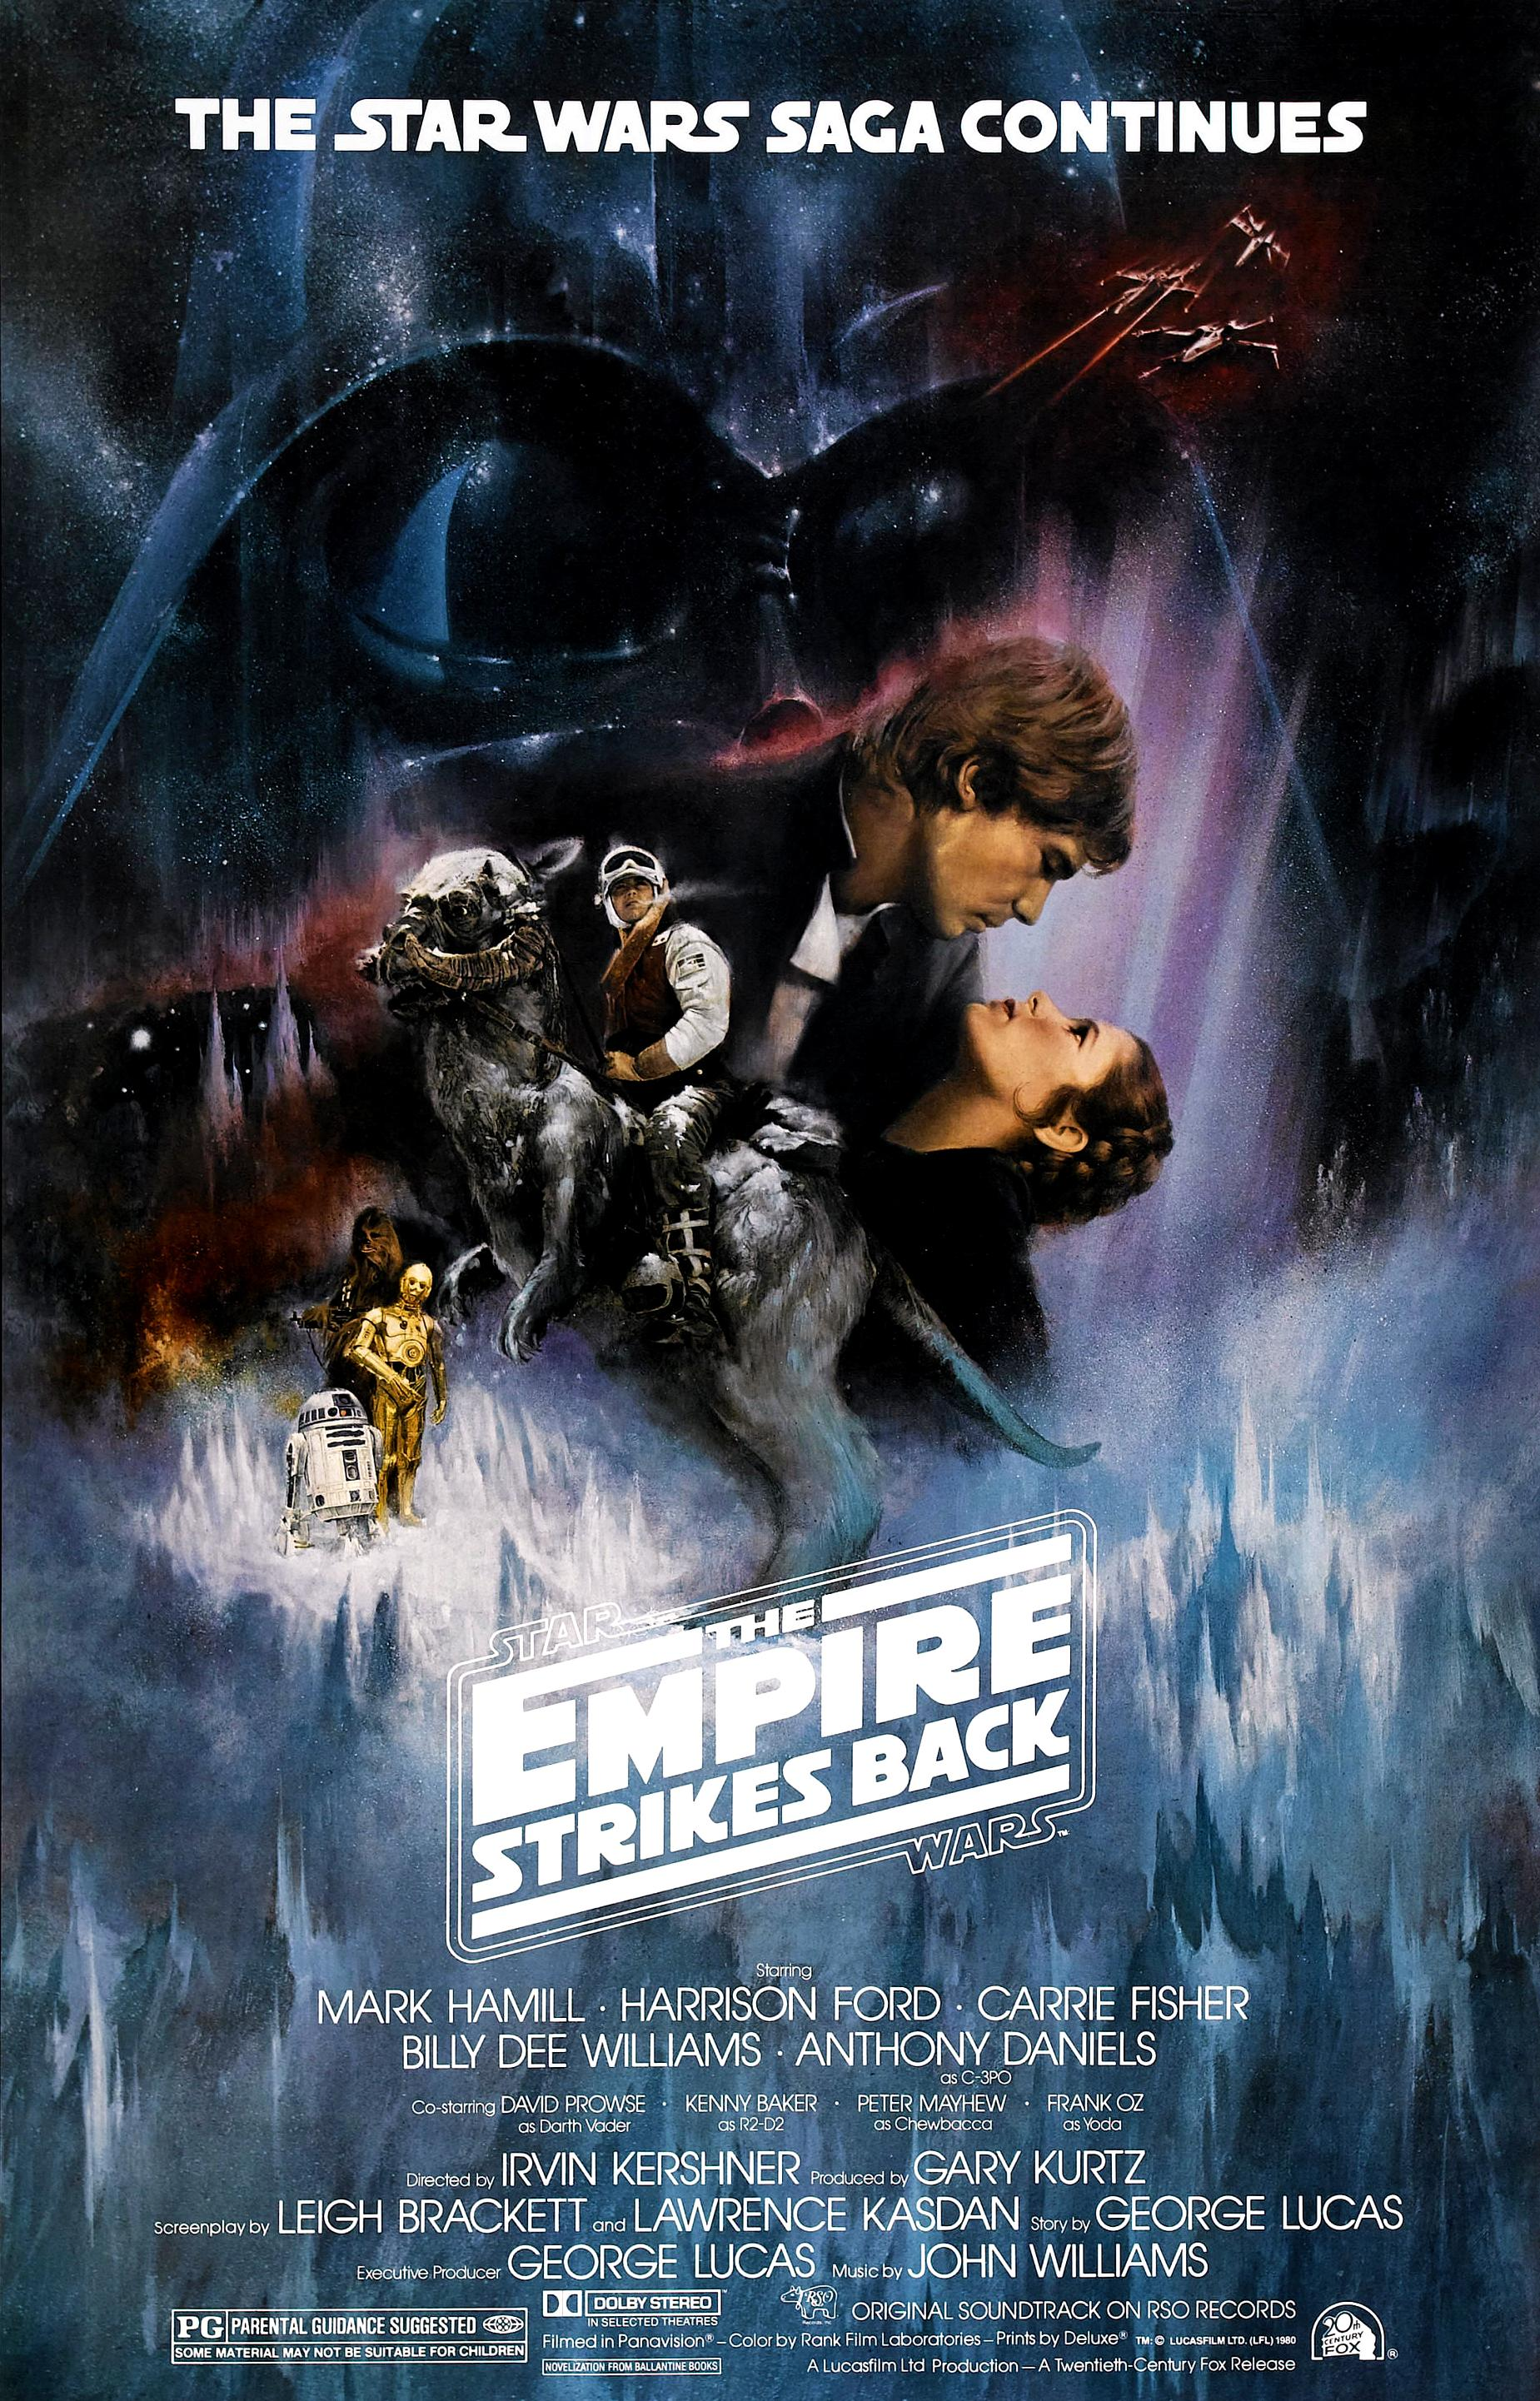 Star Wars: Episode V - The Empire Strikes Back (1980) - IMDb